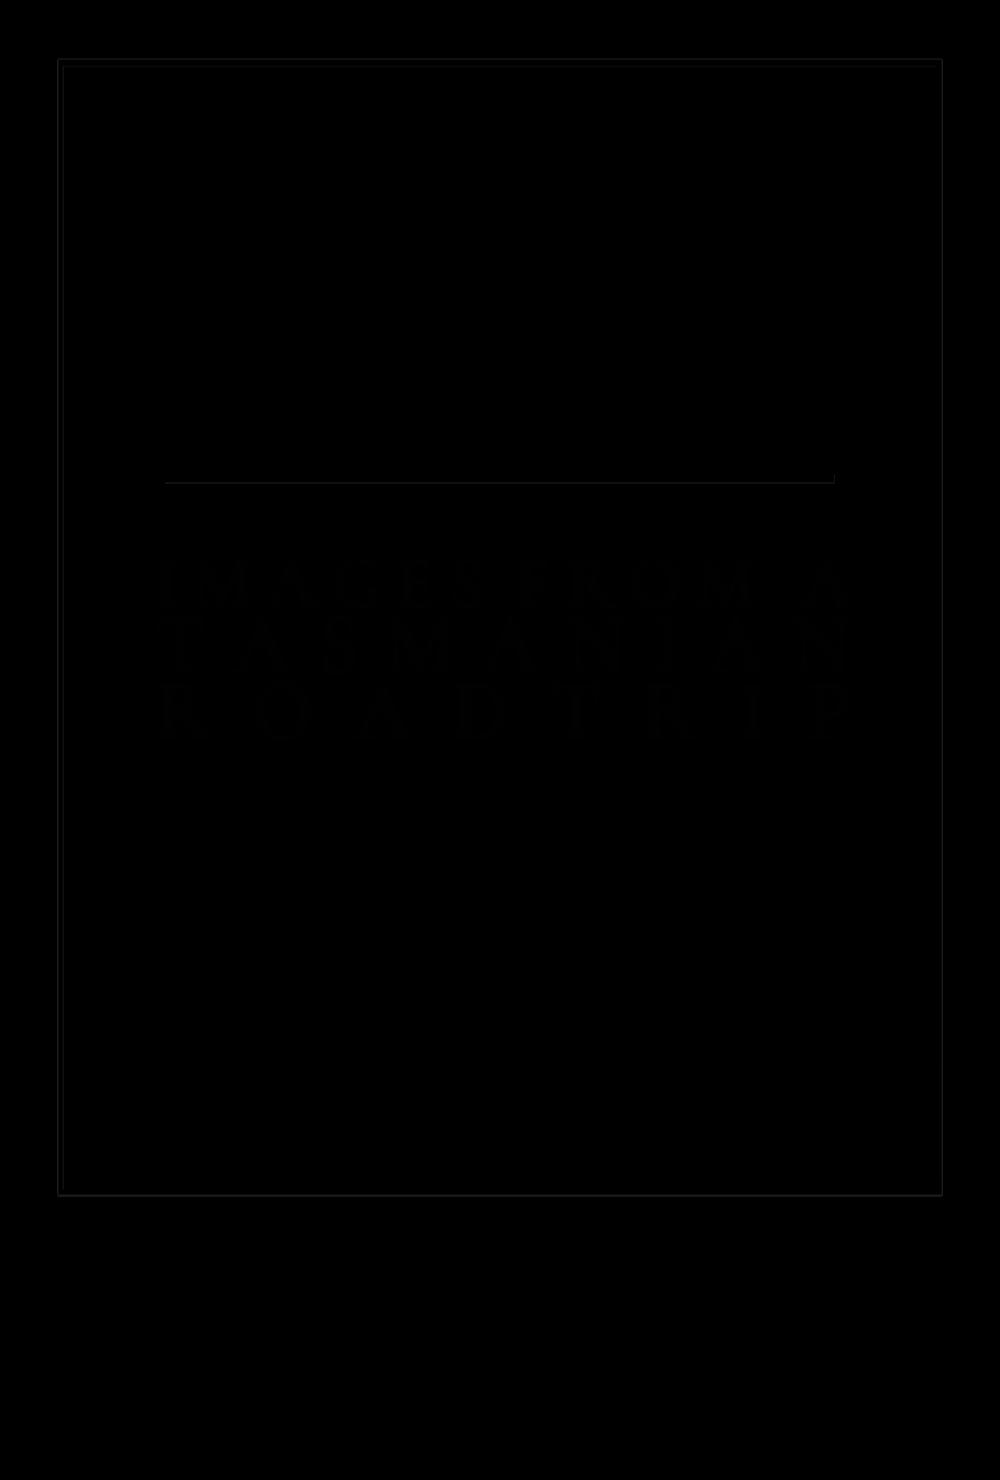 002 black no date no maker.png